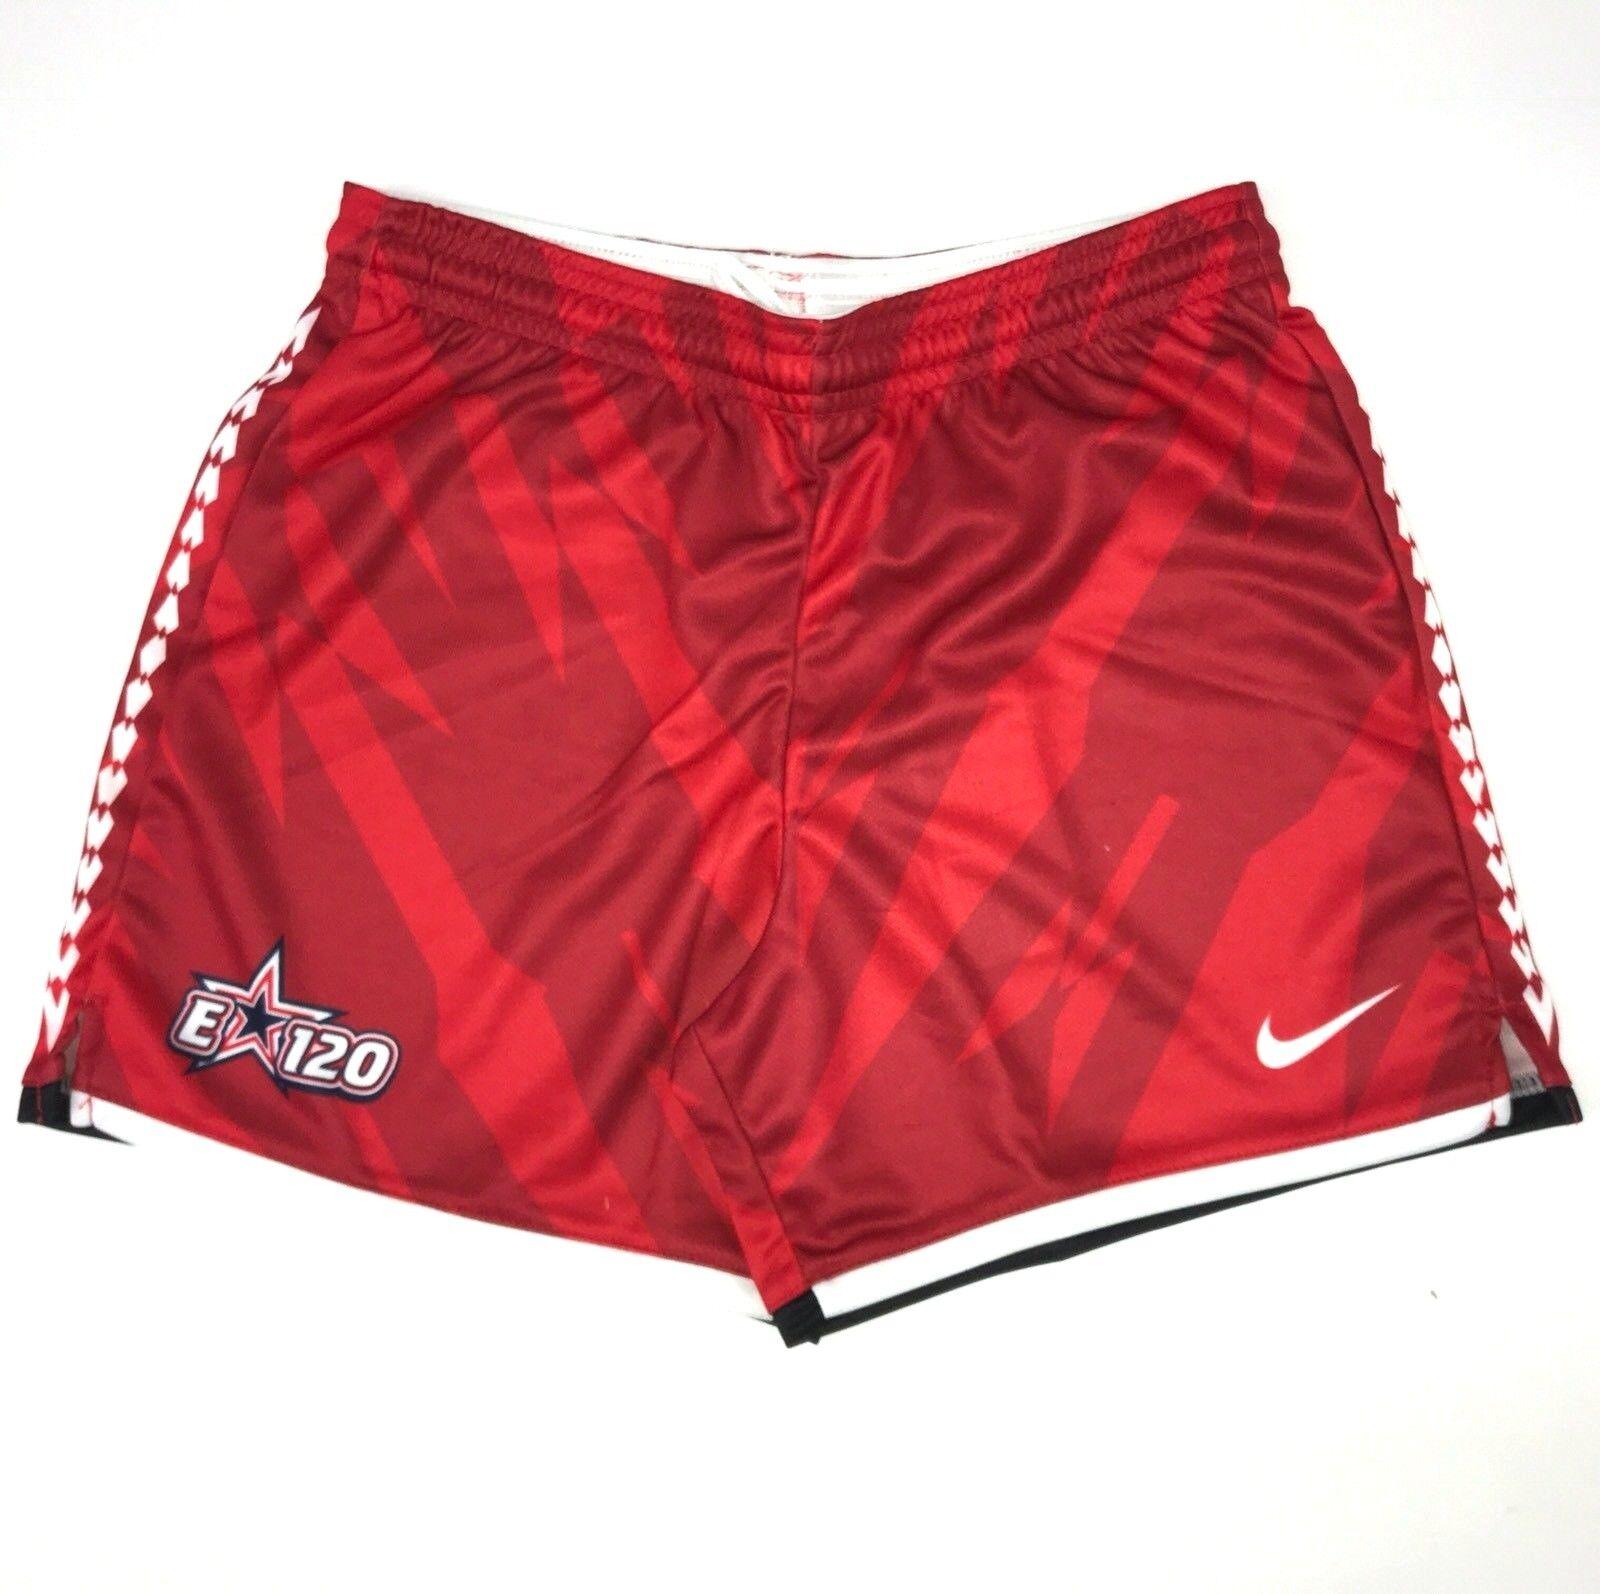 Nike drifit cornell red youth lacrosse shorts nwt youth medium